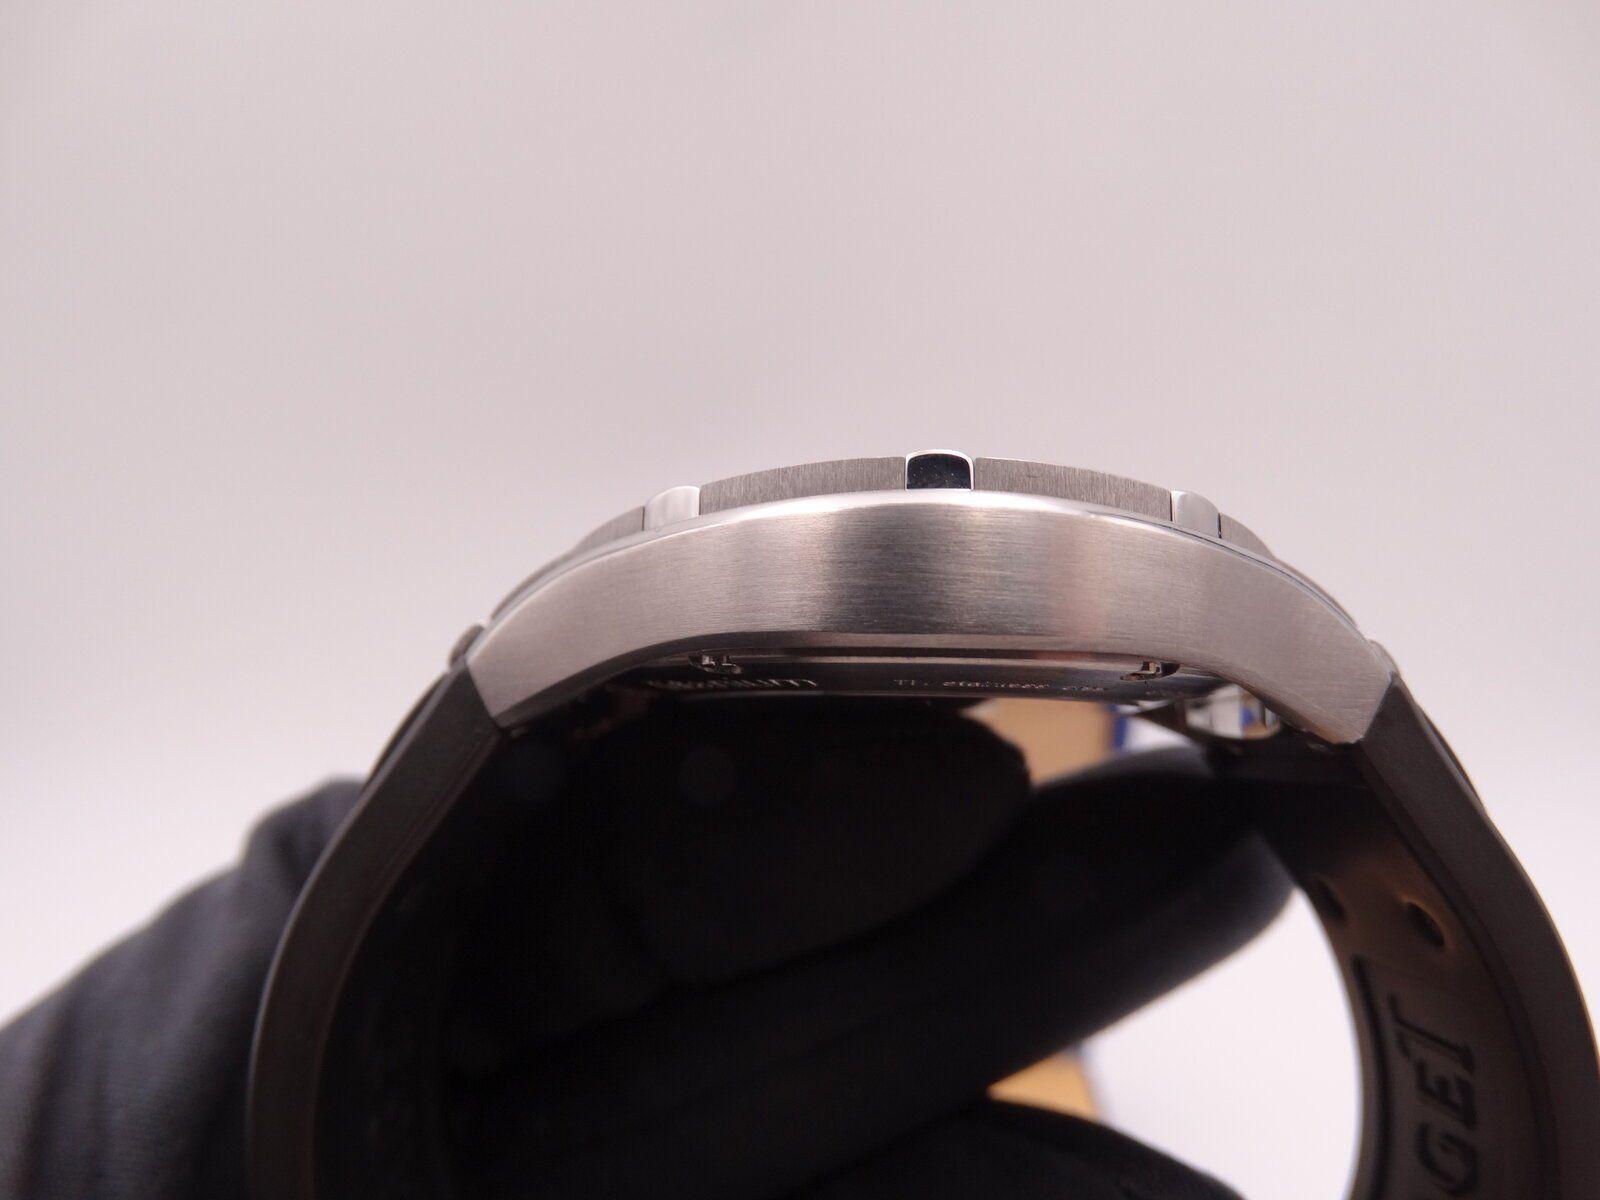 Piaget Polo FortyFive Titanium 01231.JPG